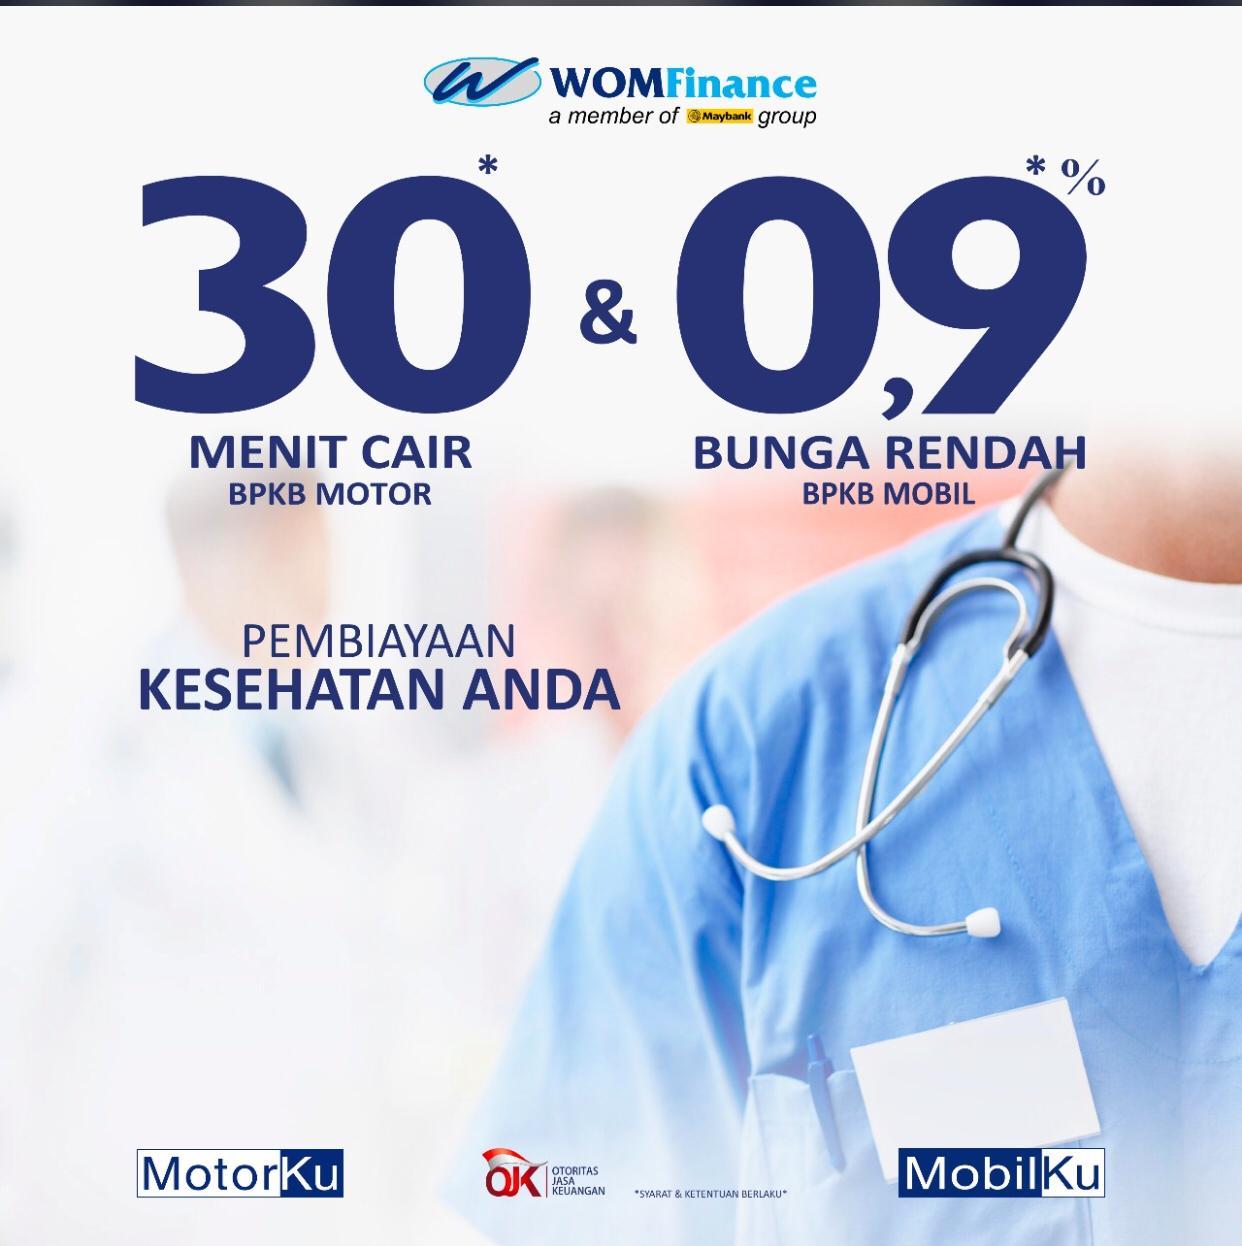 Pinjaman Kredit Jaminan Gadai Bpkb Motor Mobil Dengan ...